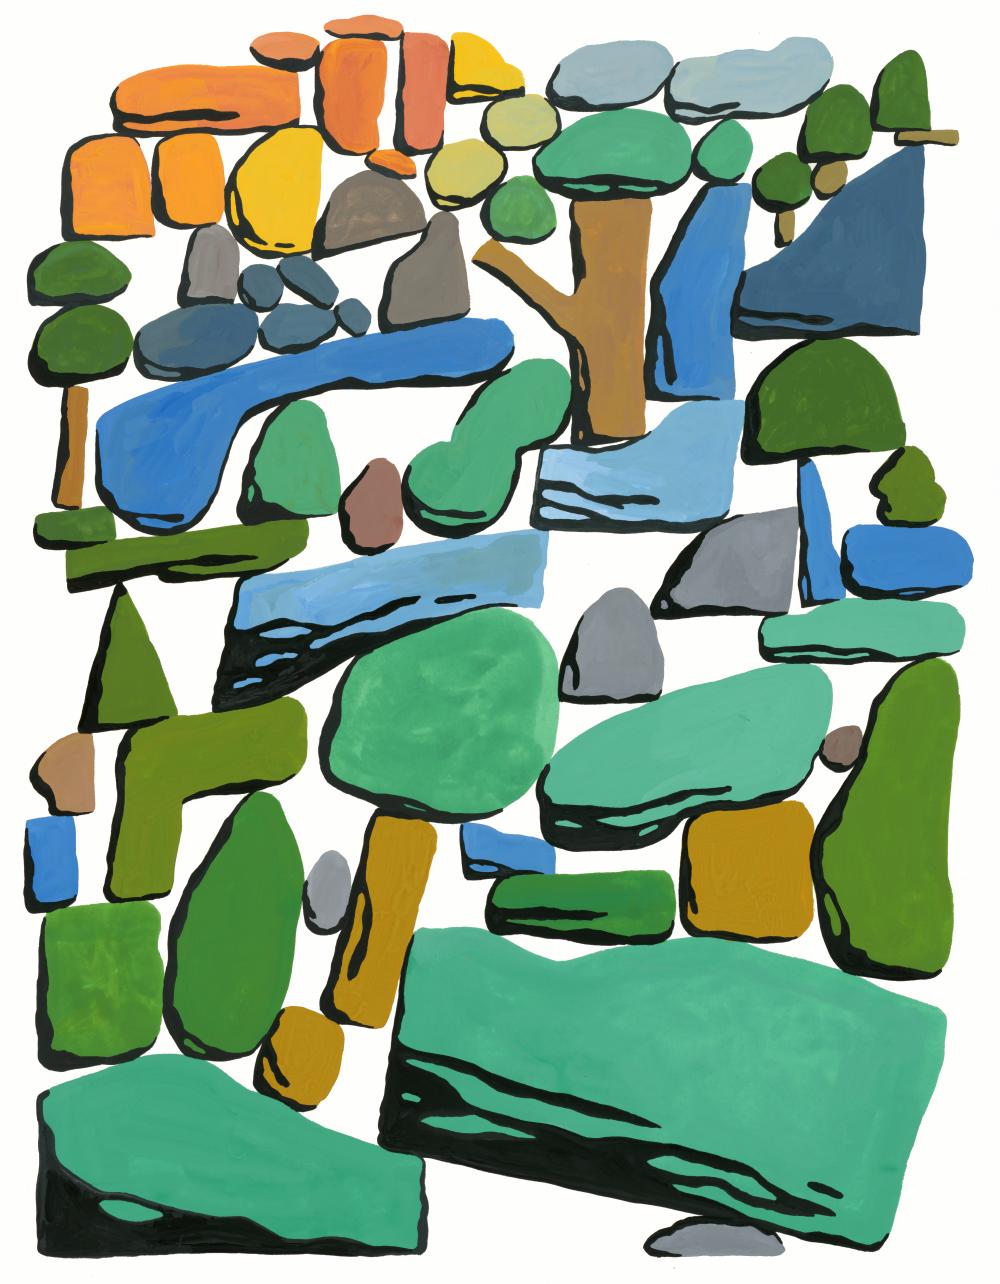 Outdoors, Gouache on board, 2017, 16 x 20